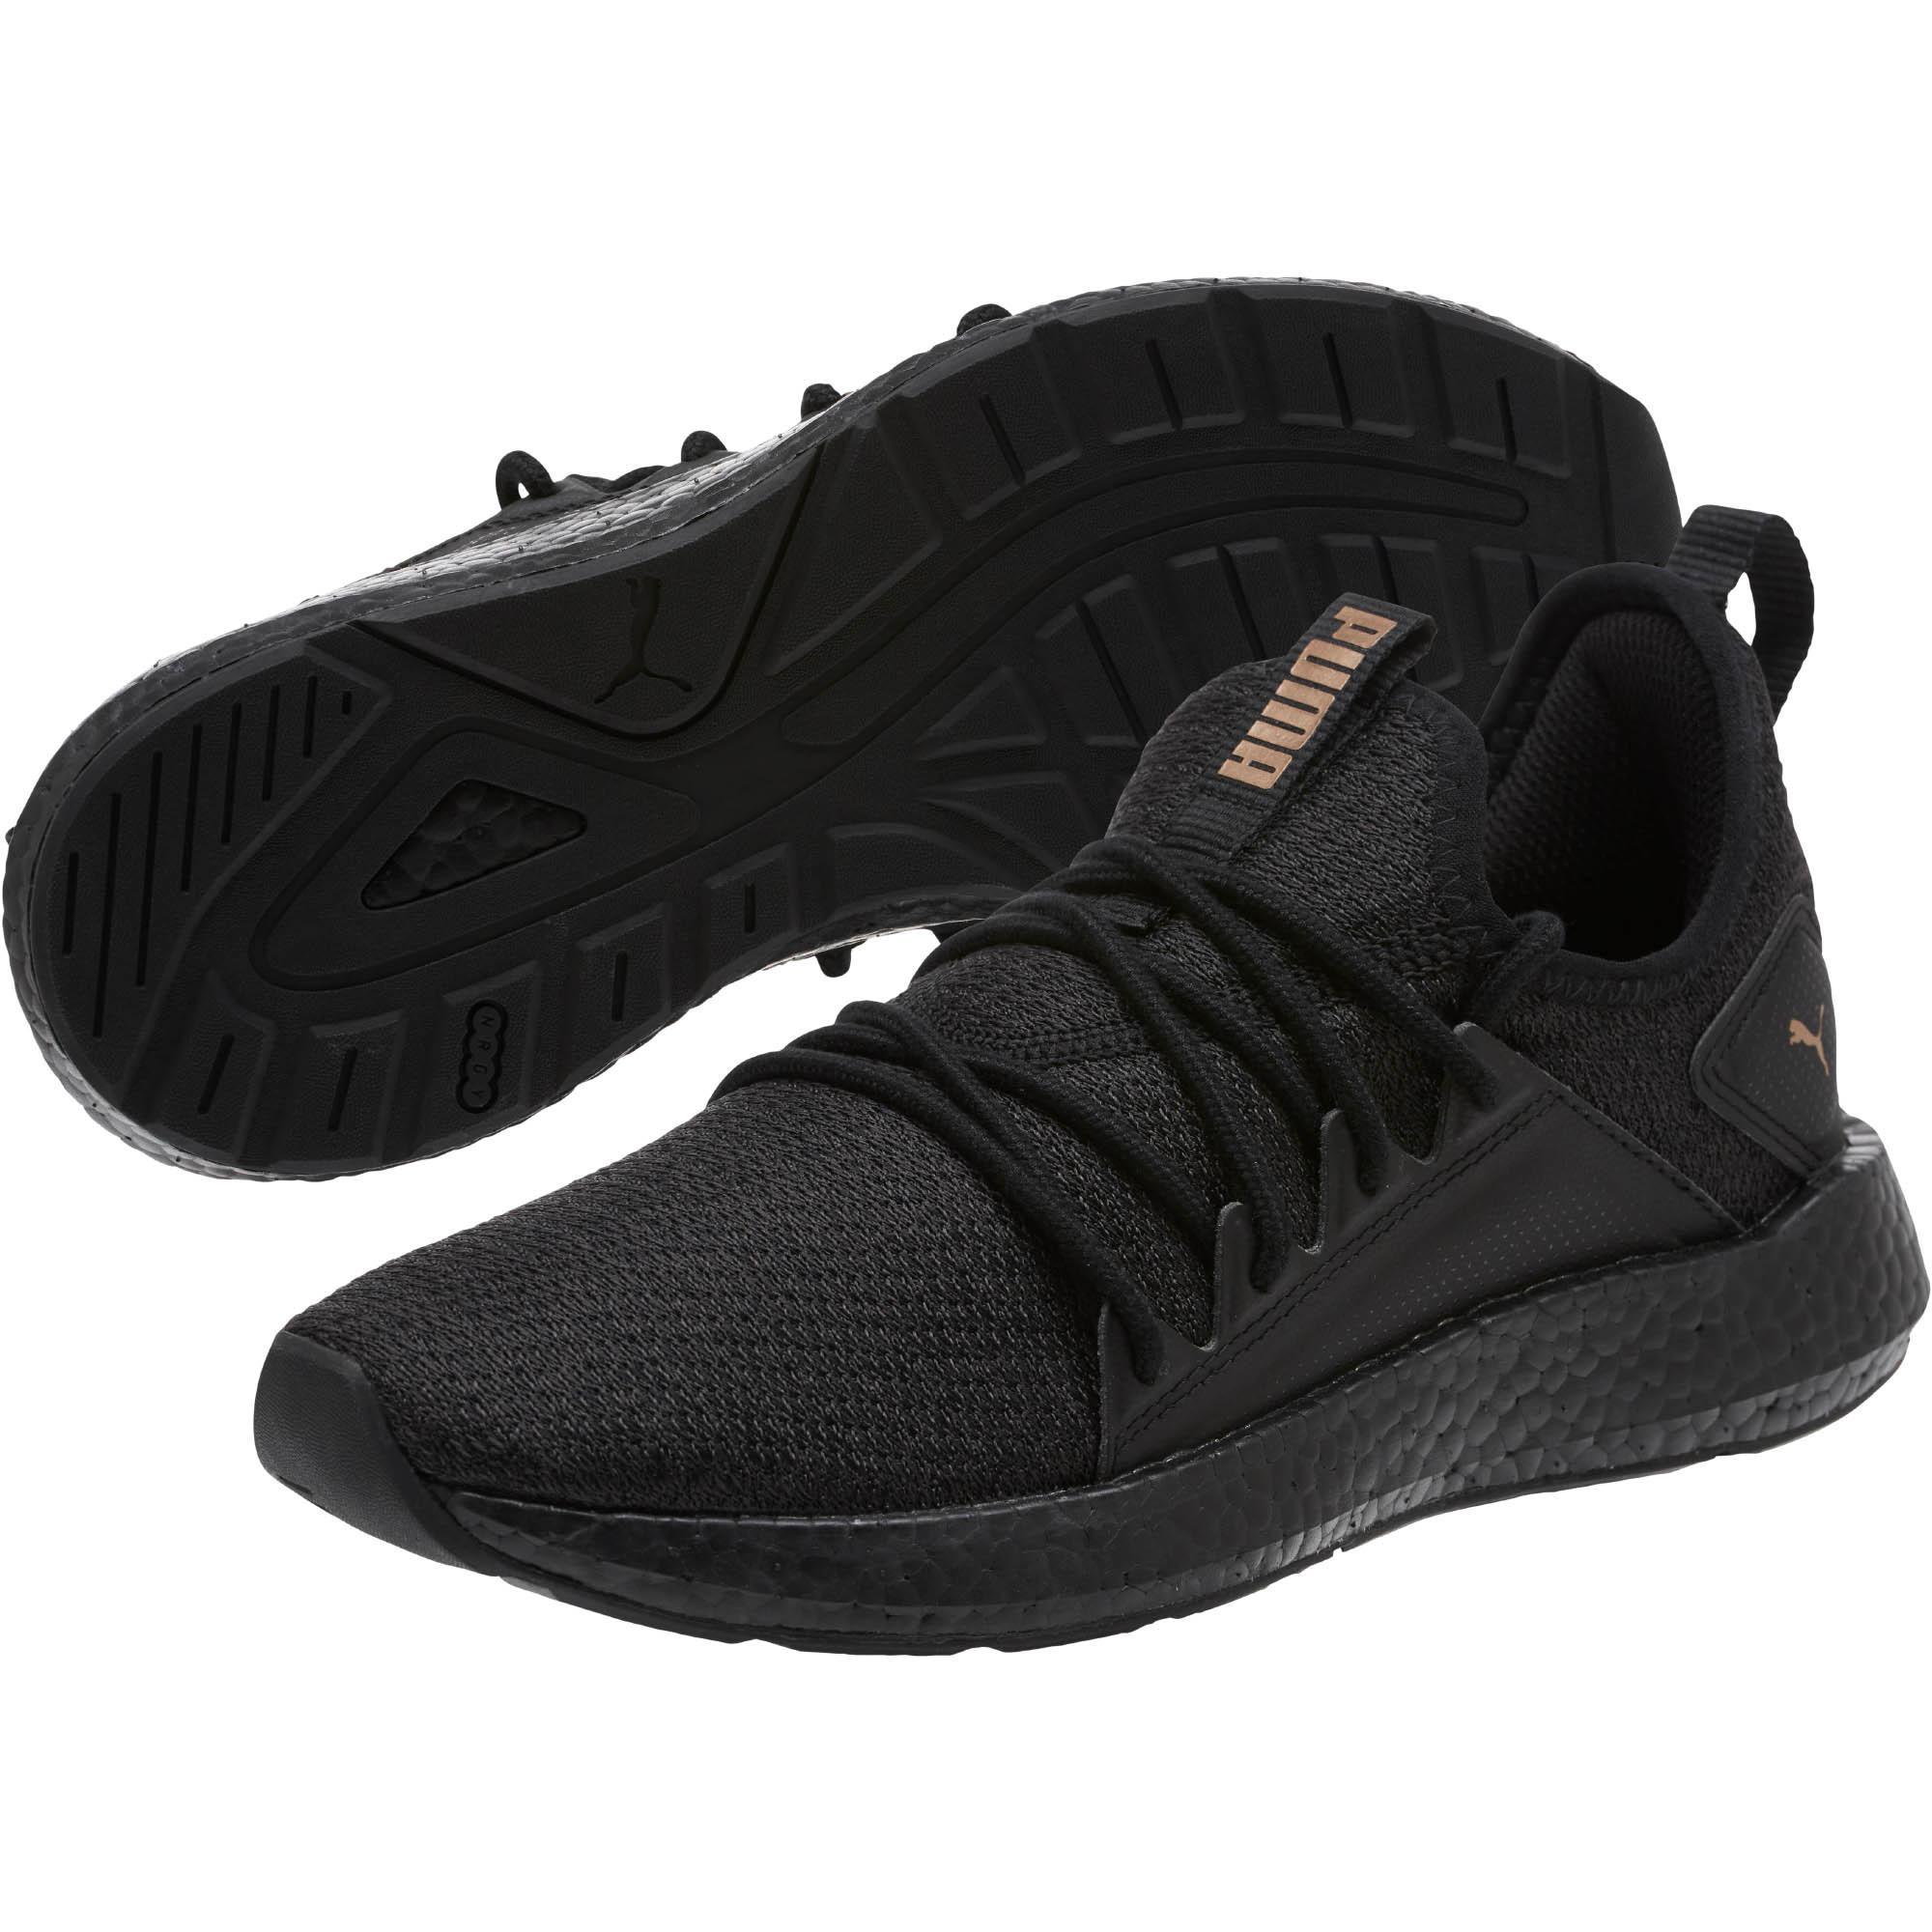 PUMA - Black Nrgy Neko Knit Women s Running Shoes - Lyst. View fullscreen 4f3a5dfff